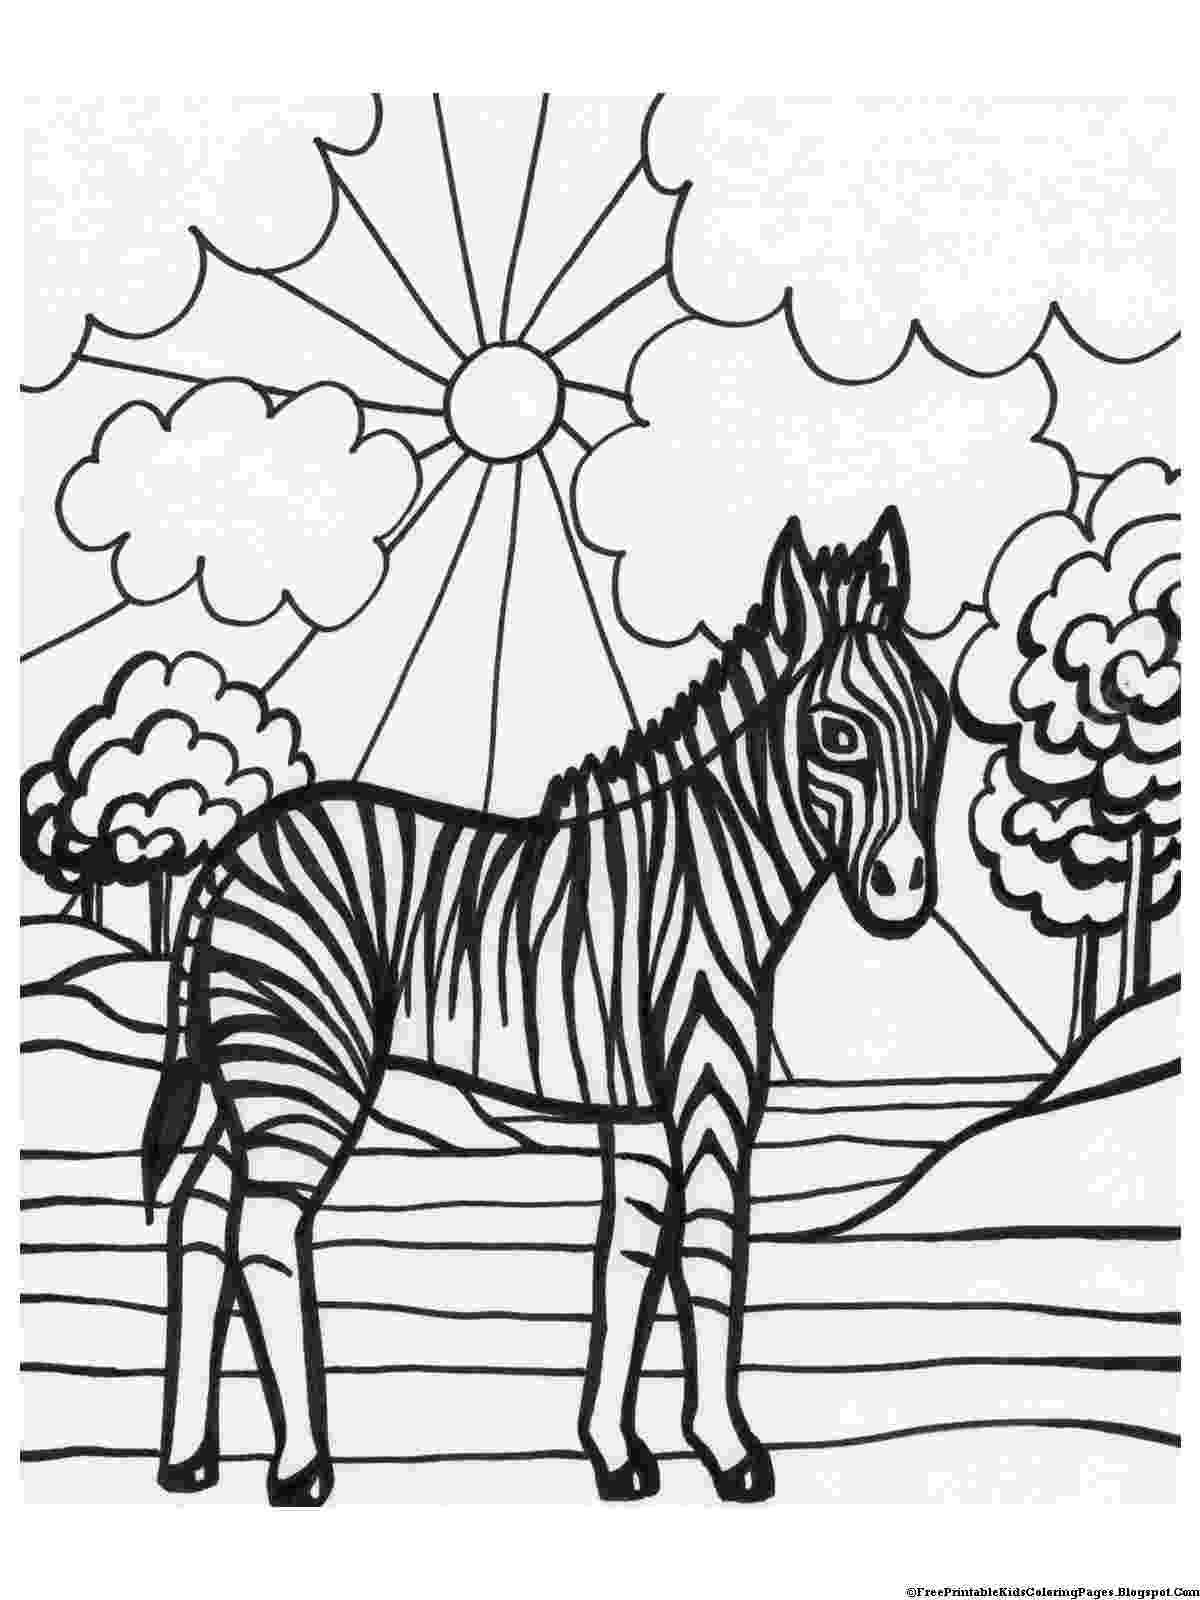 coloring pictures free printable cinderella activity sheets and coloring pictures coloring